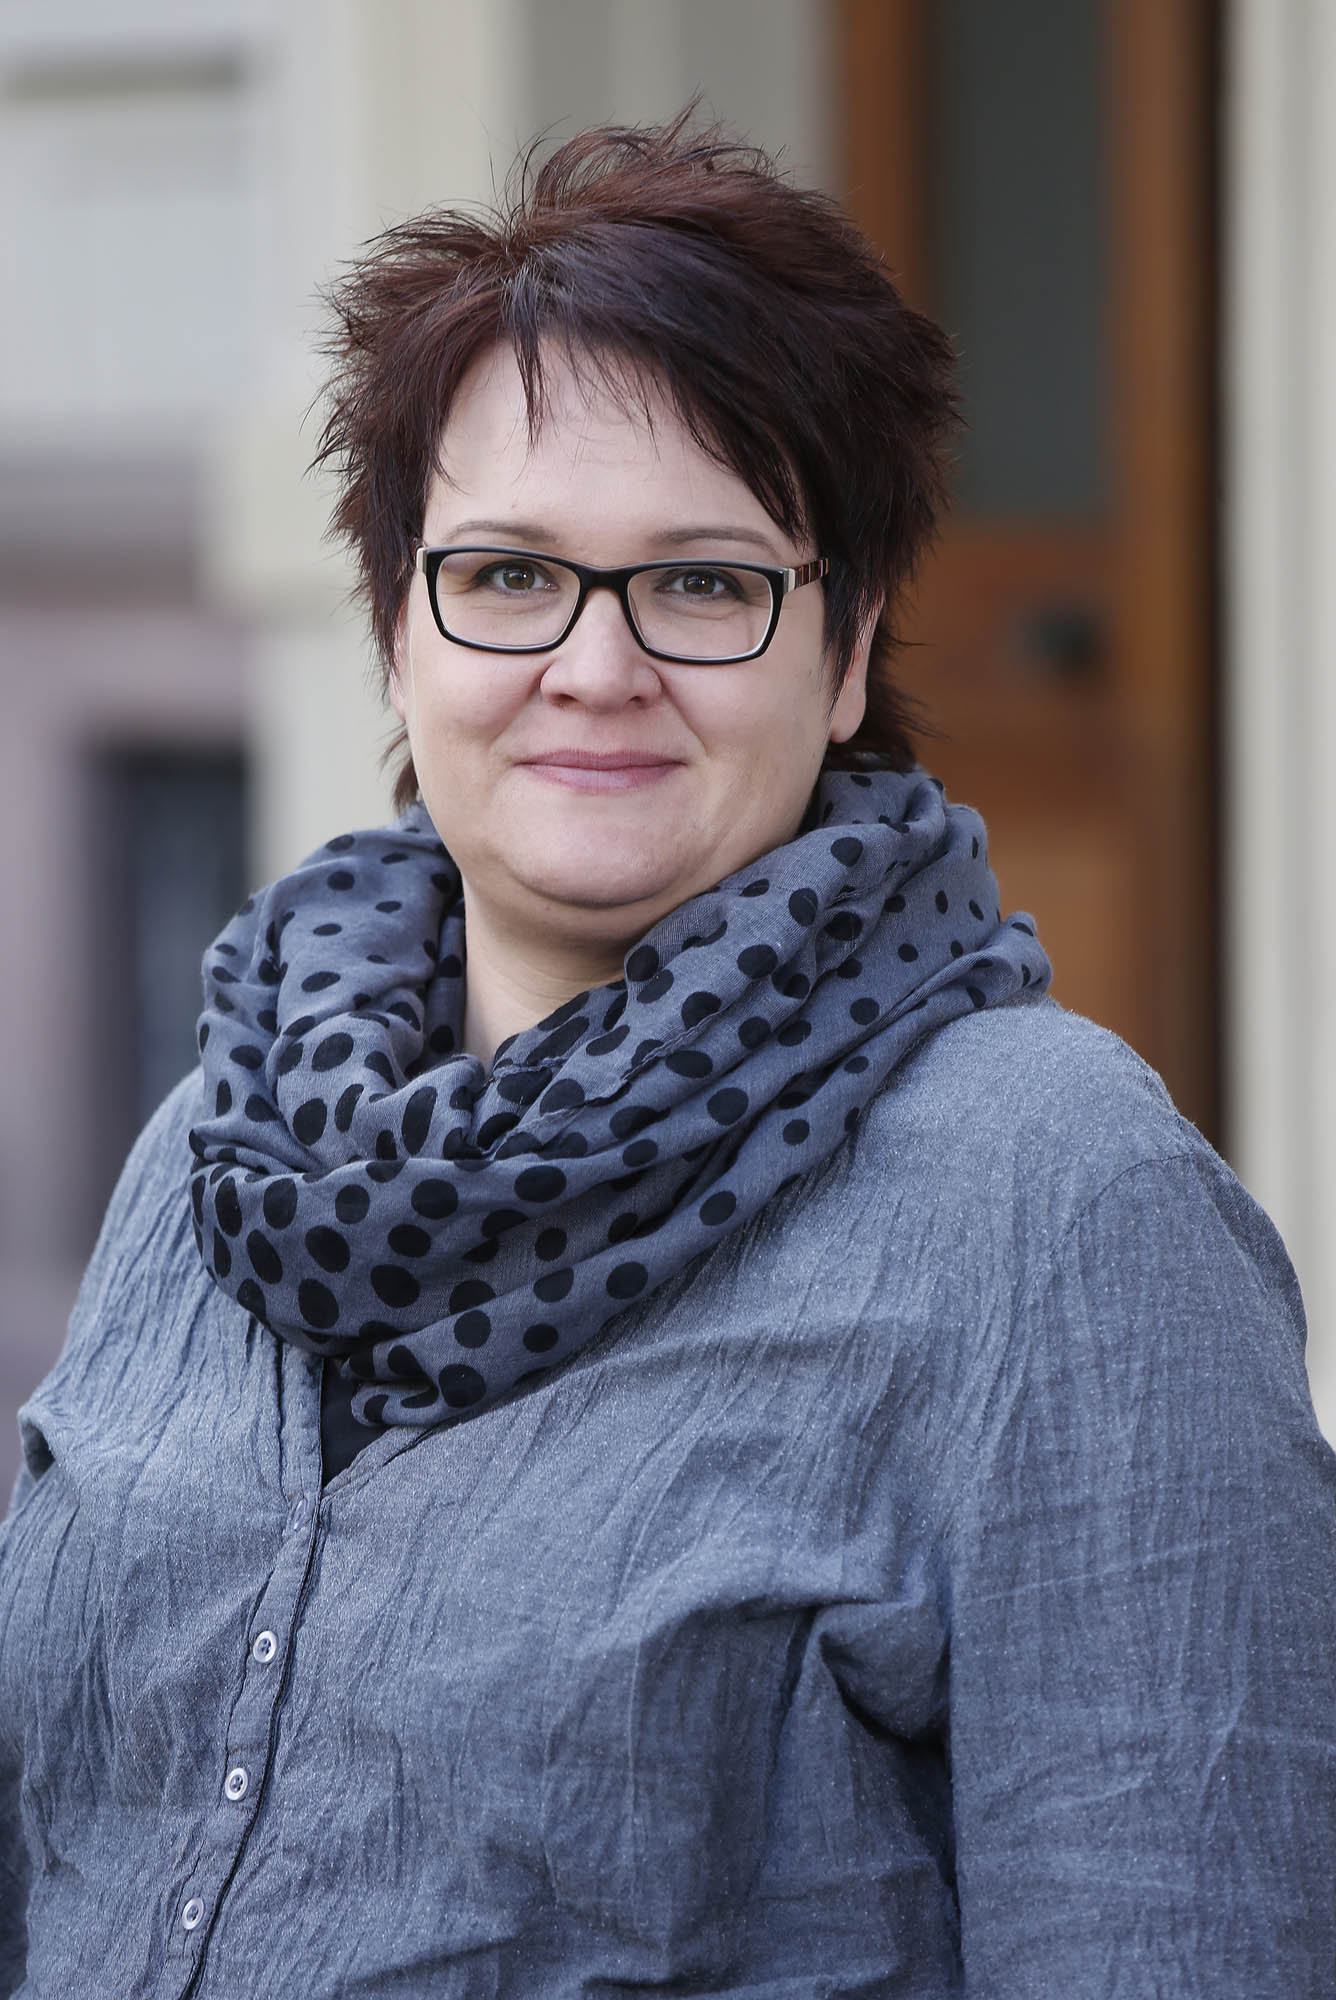 Verena Loock